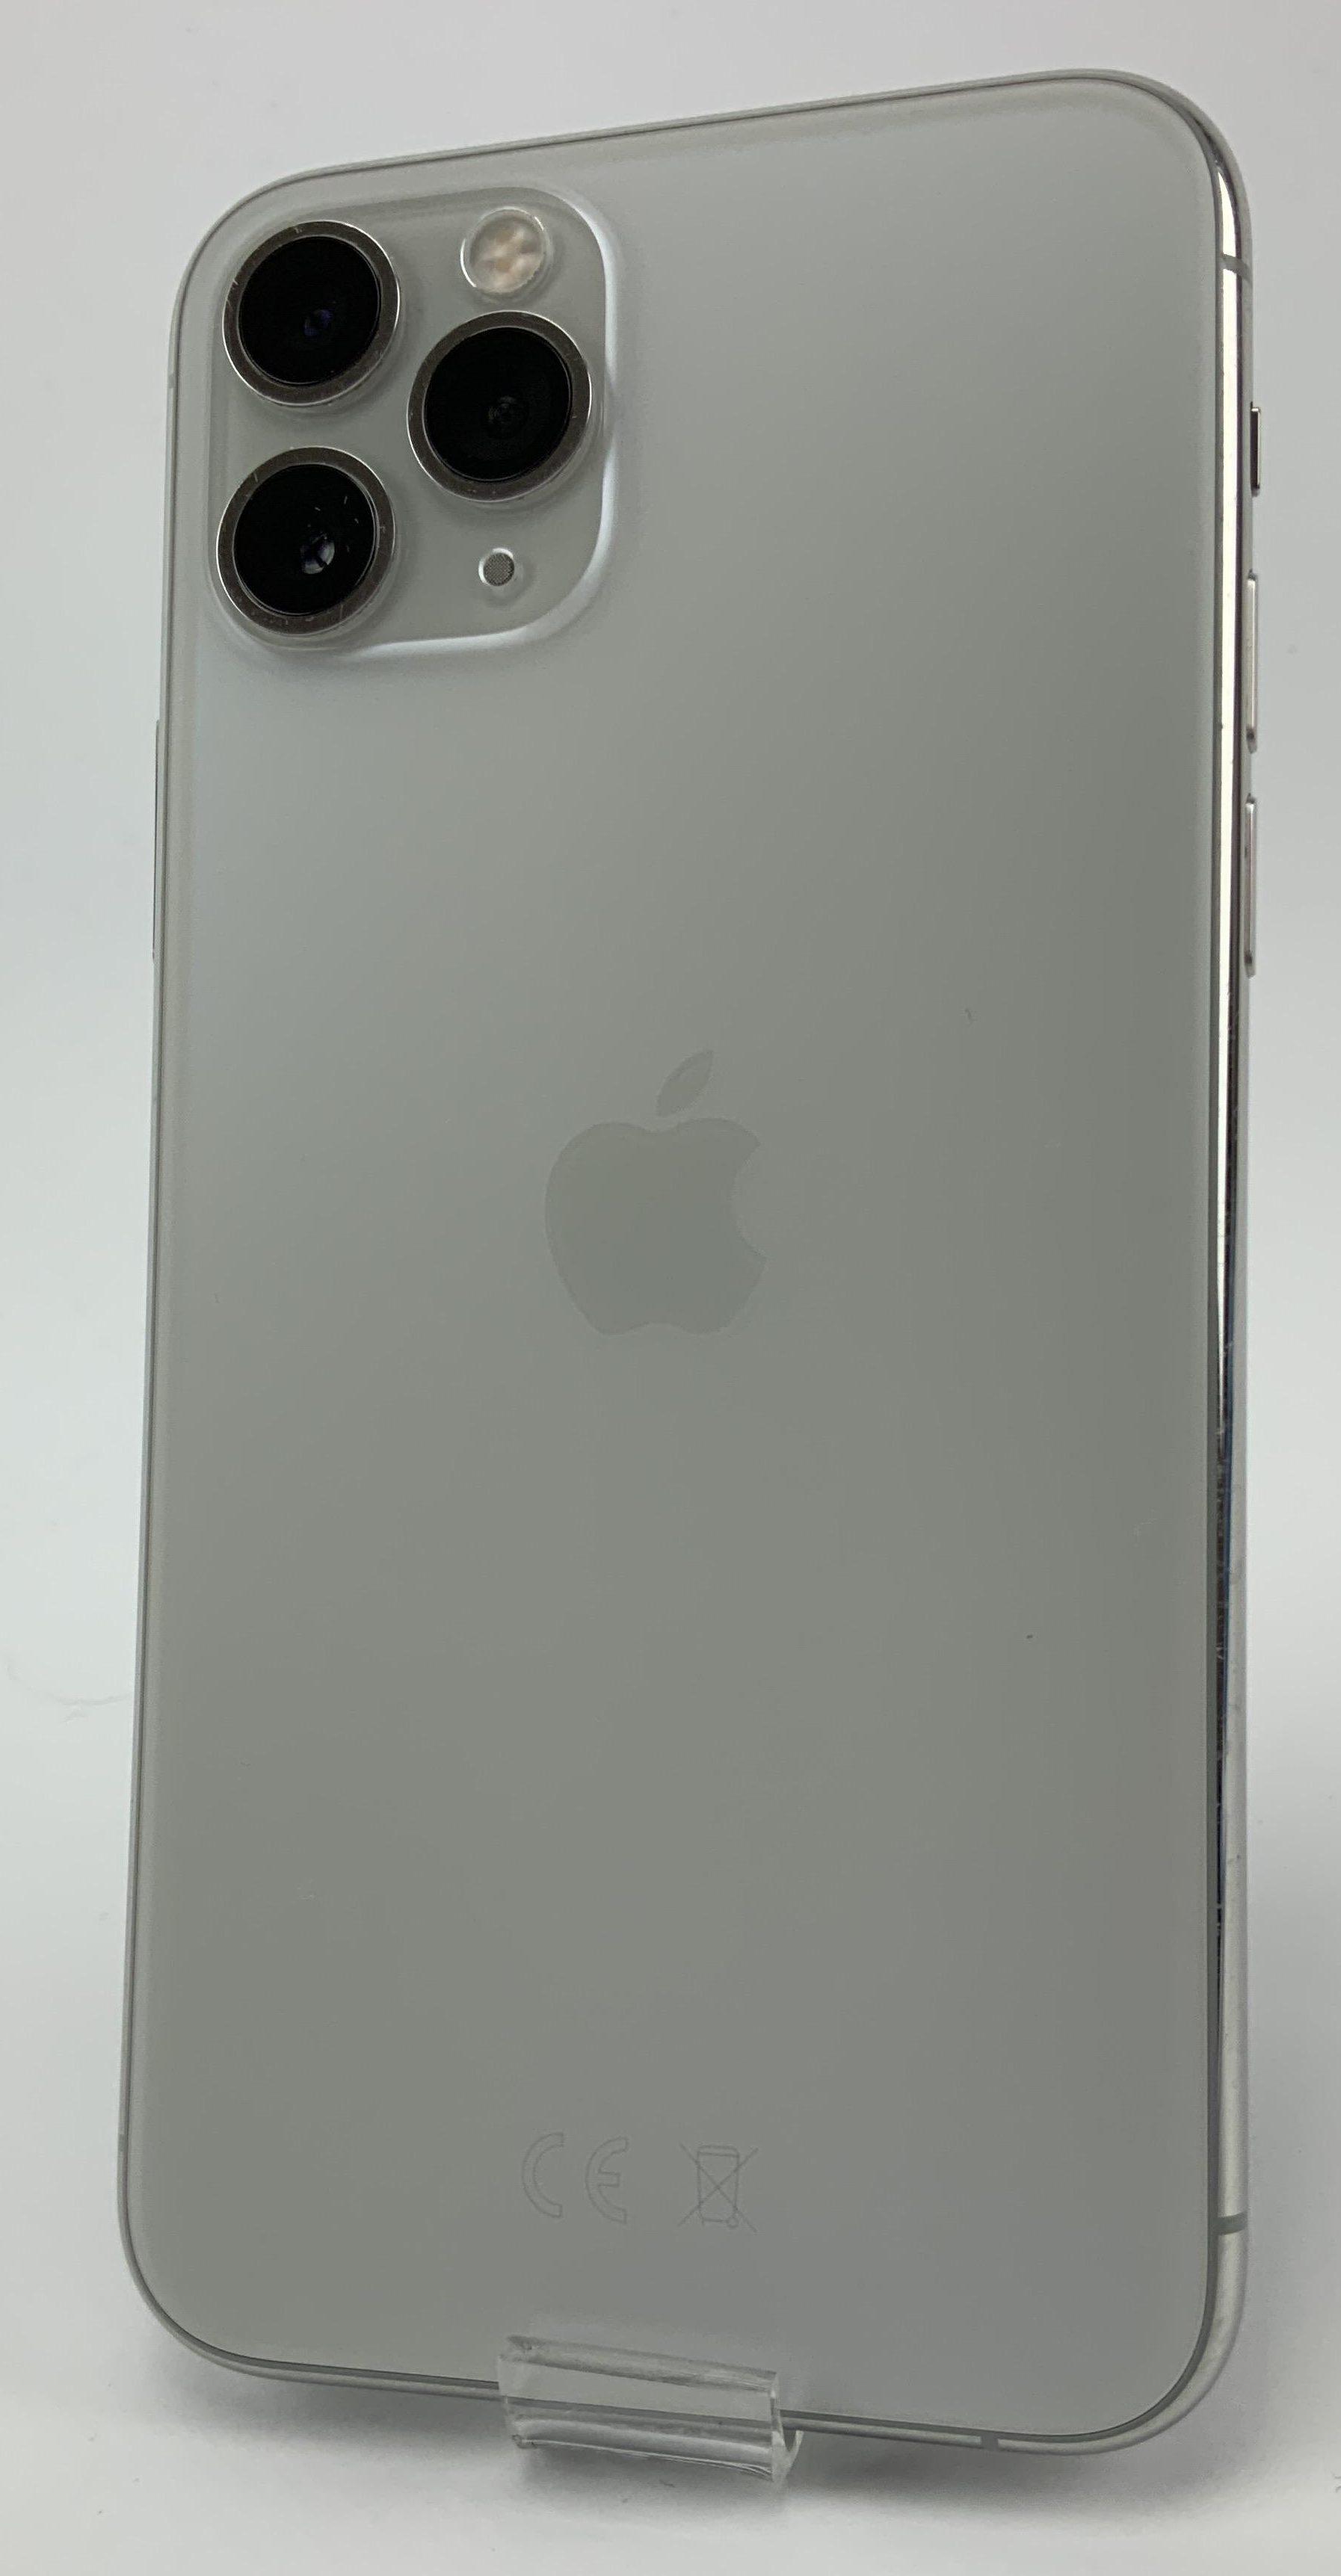 iPhone 11 Pro 256GB, 256GB, Silver, image 2